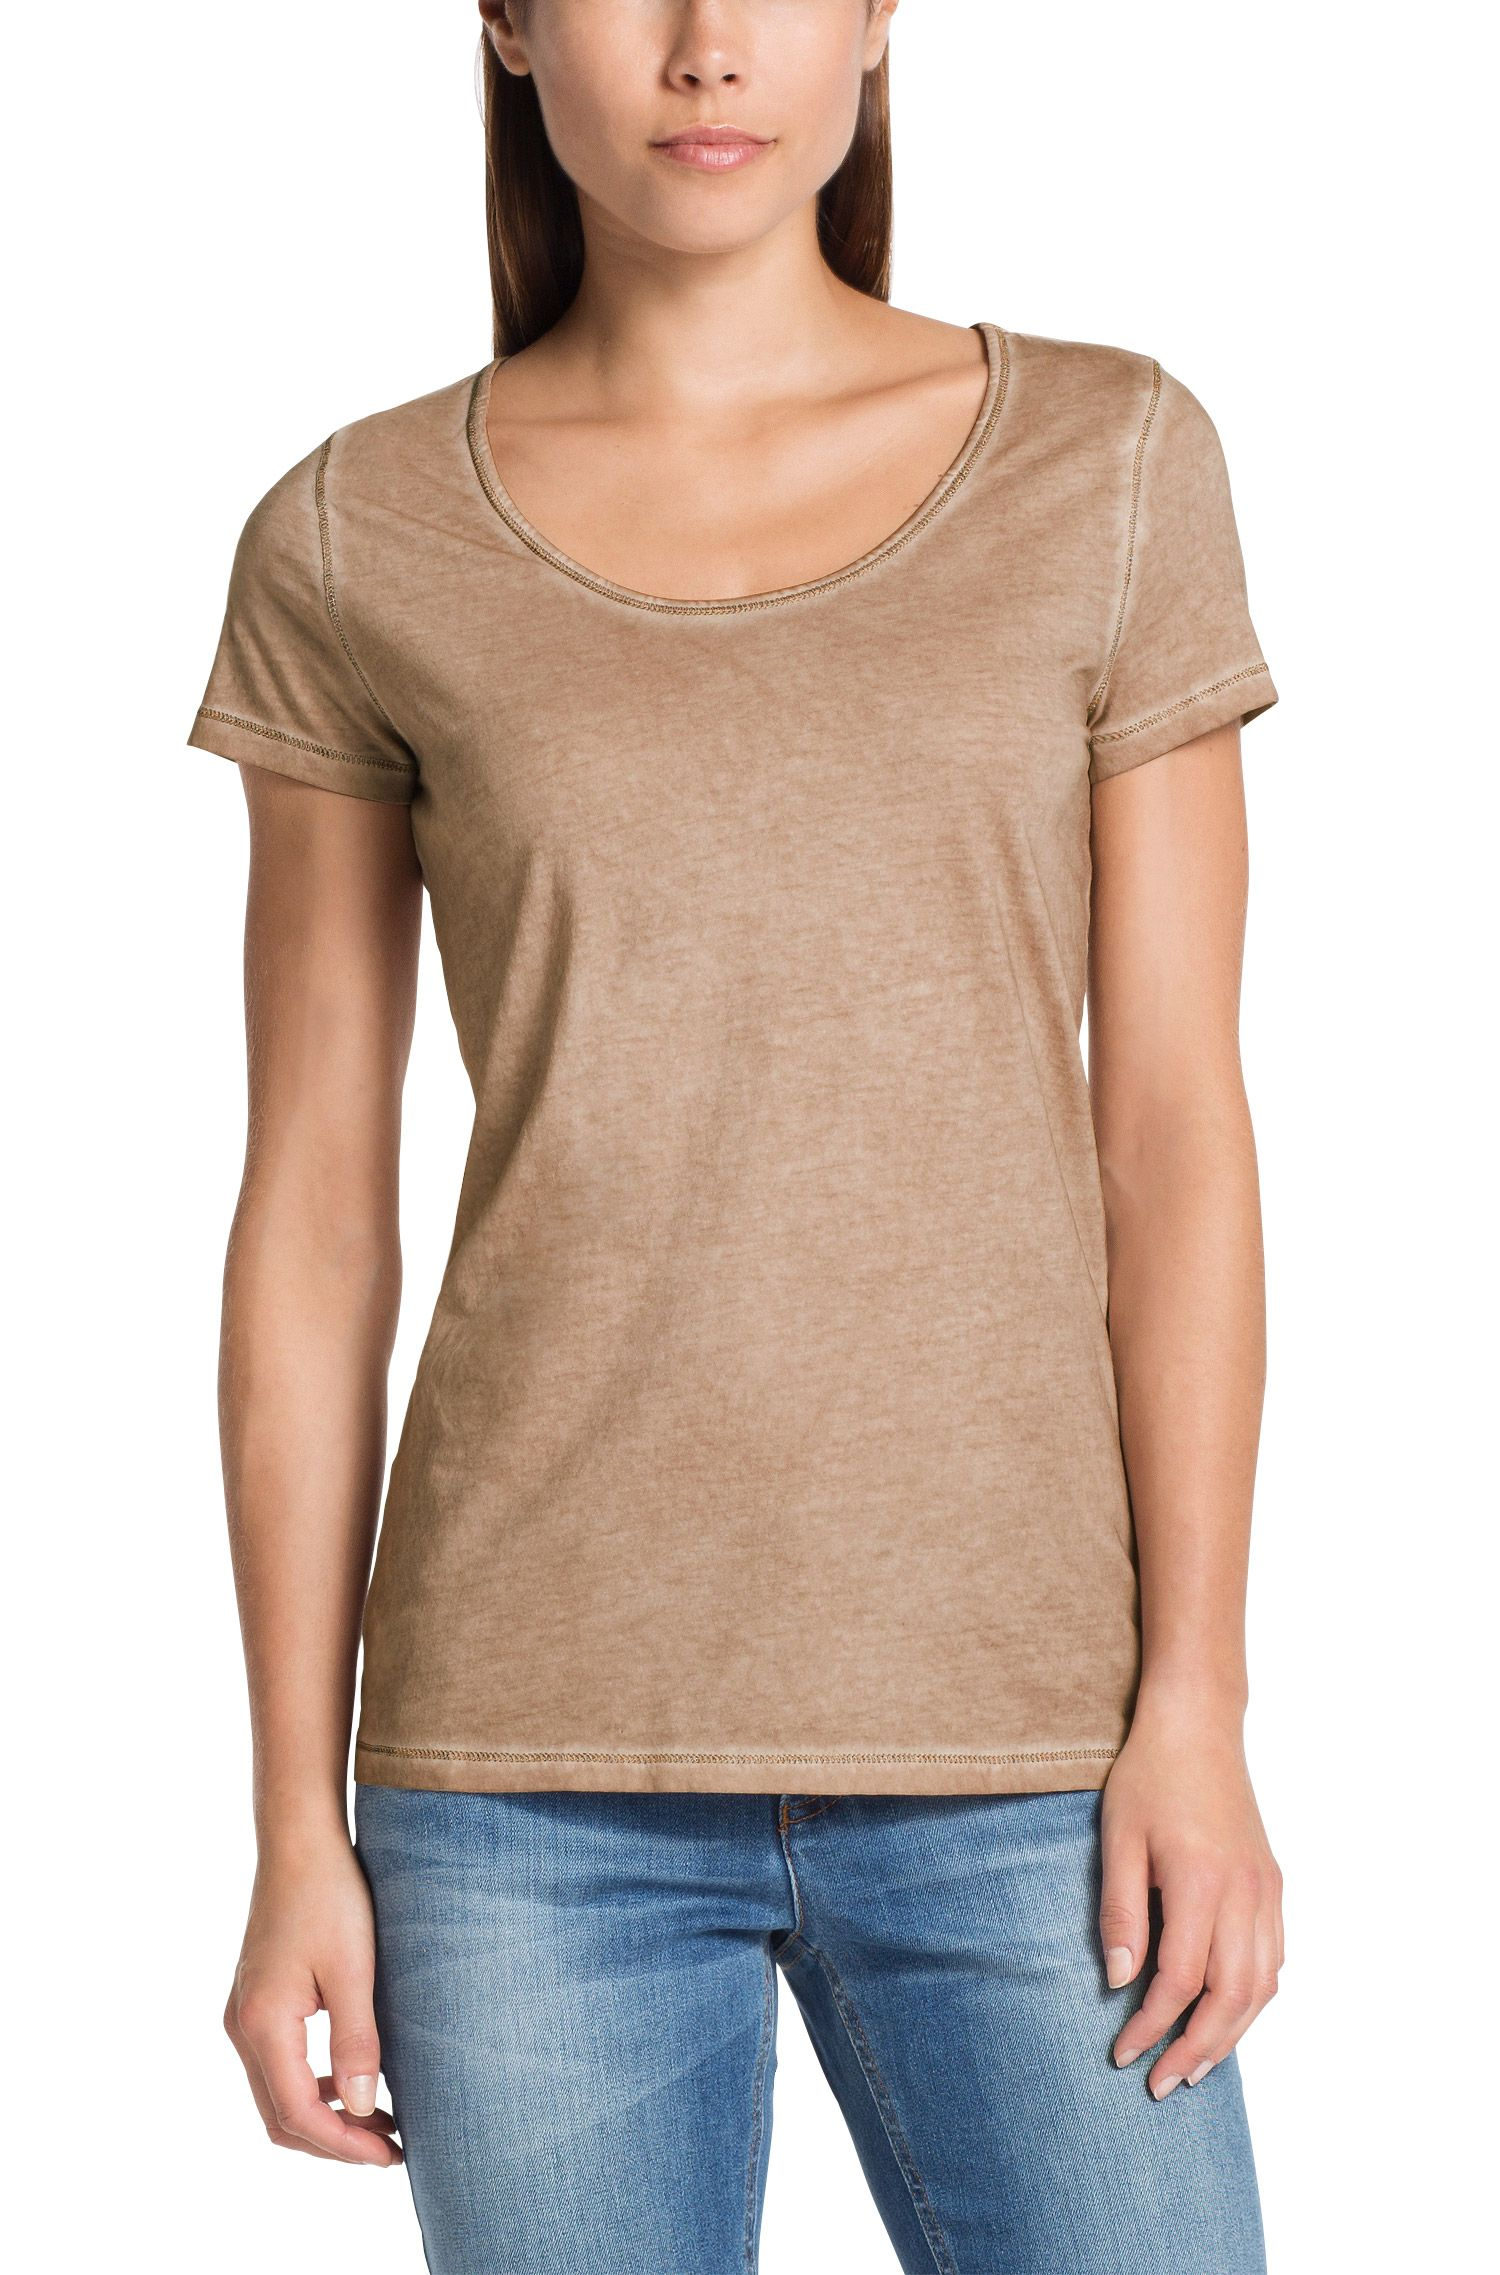 T-Shirt ´Tahiras` aus Baumwolle